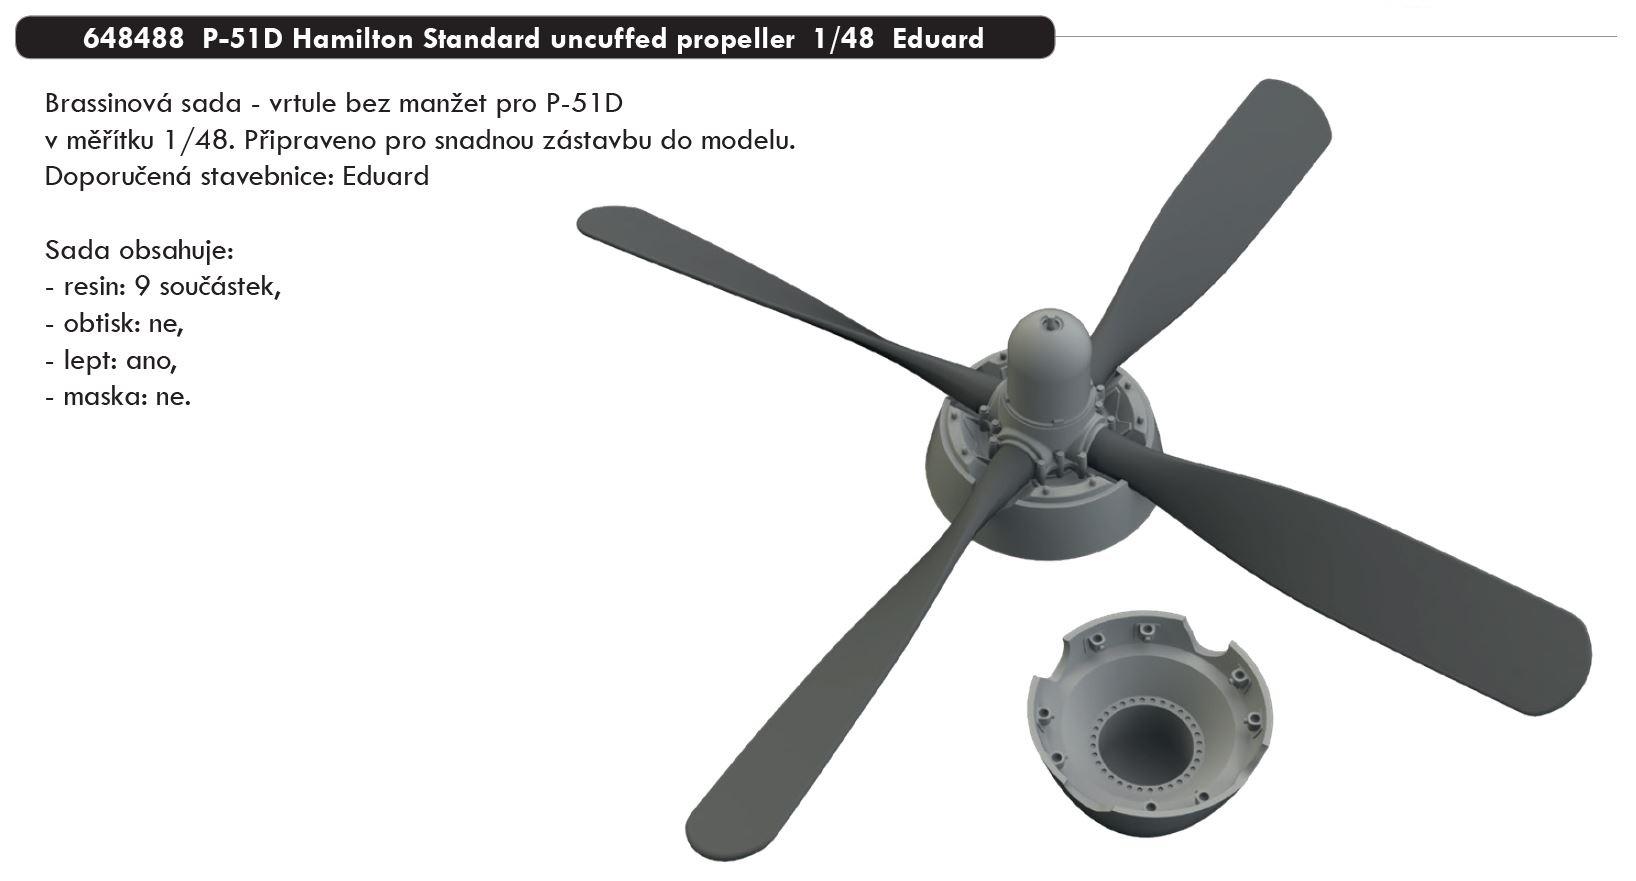 1/48 P-51D Hamilton Standard uncuffed propeller (EDUARD)